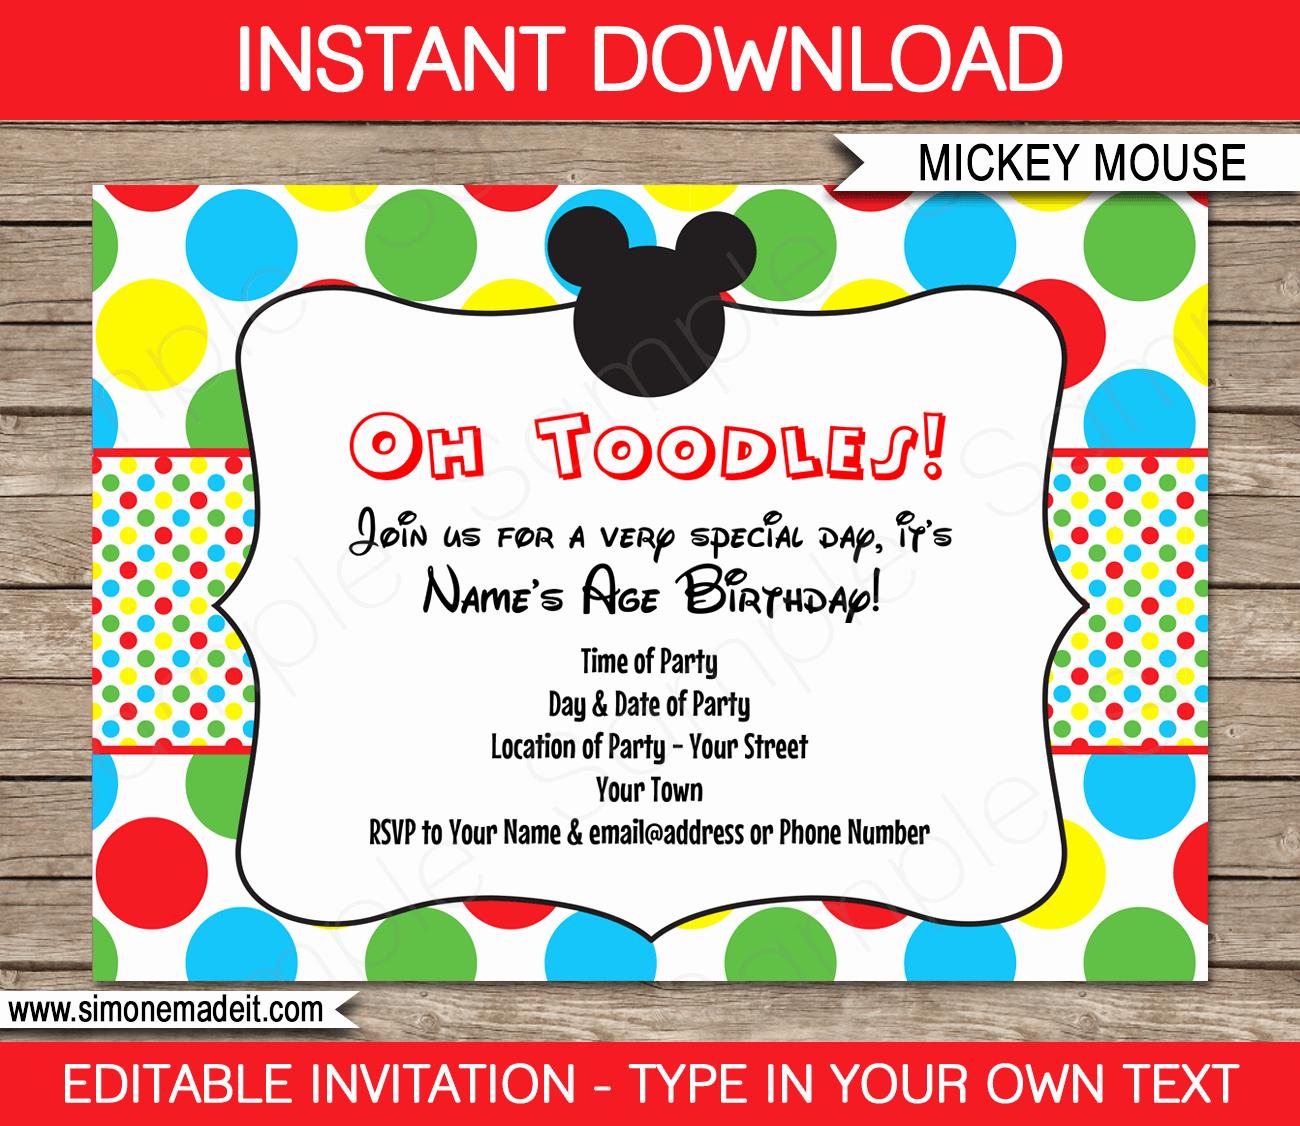 Mickey Mouse Invitations Templates New Mickey Mouse Party Invitations Template